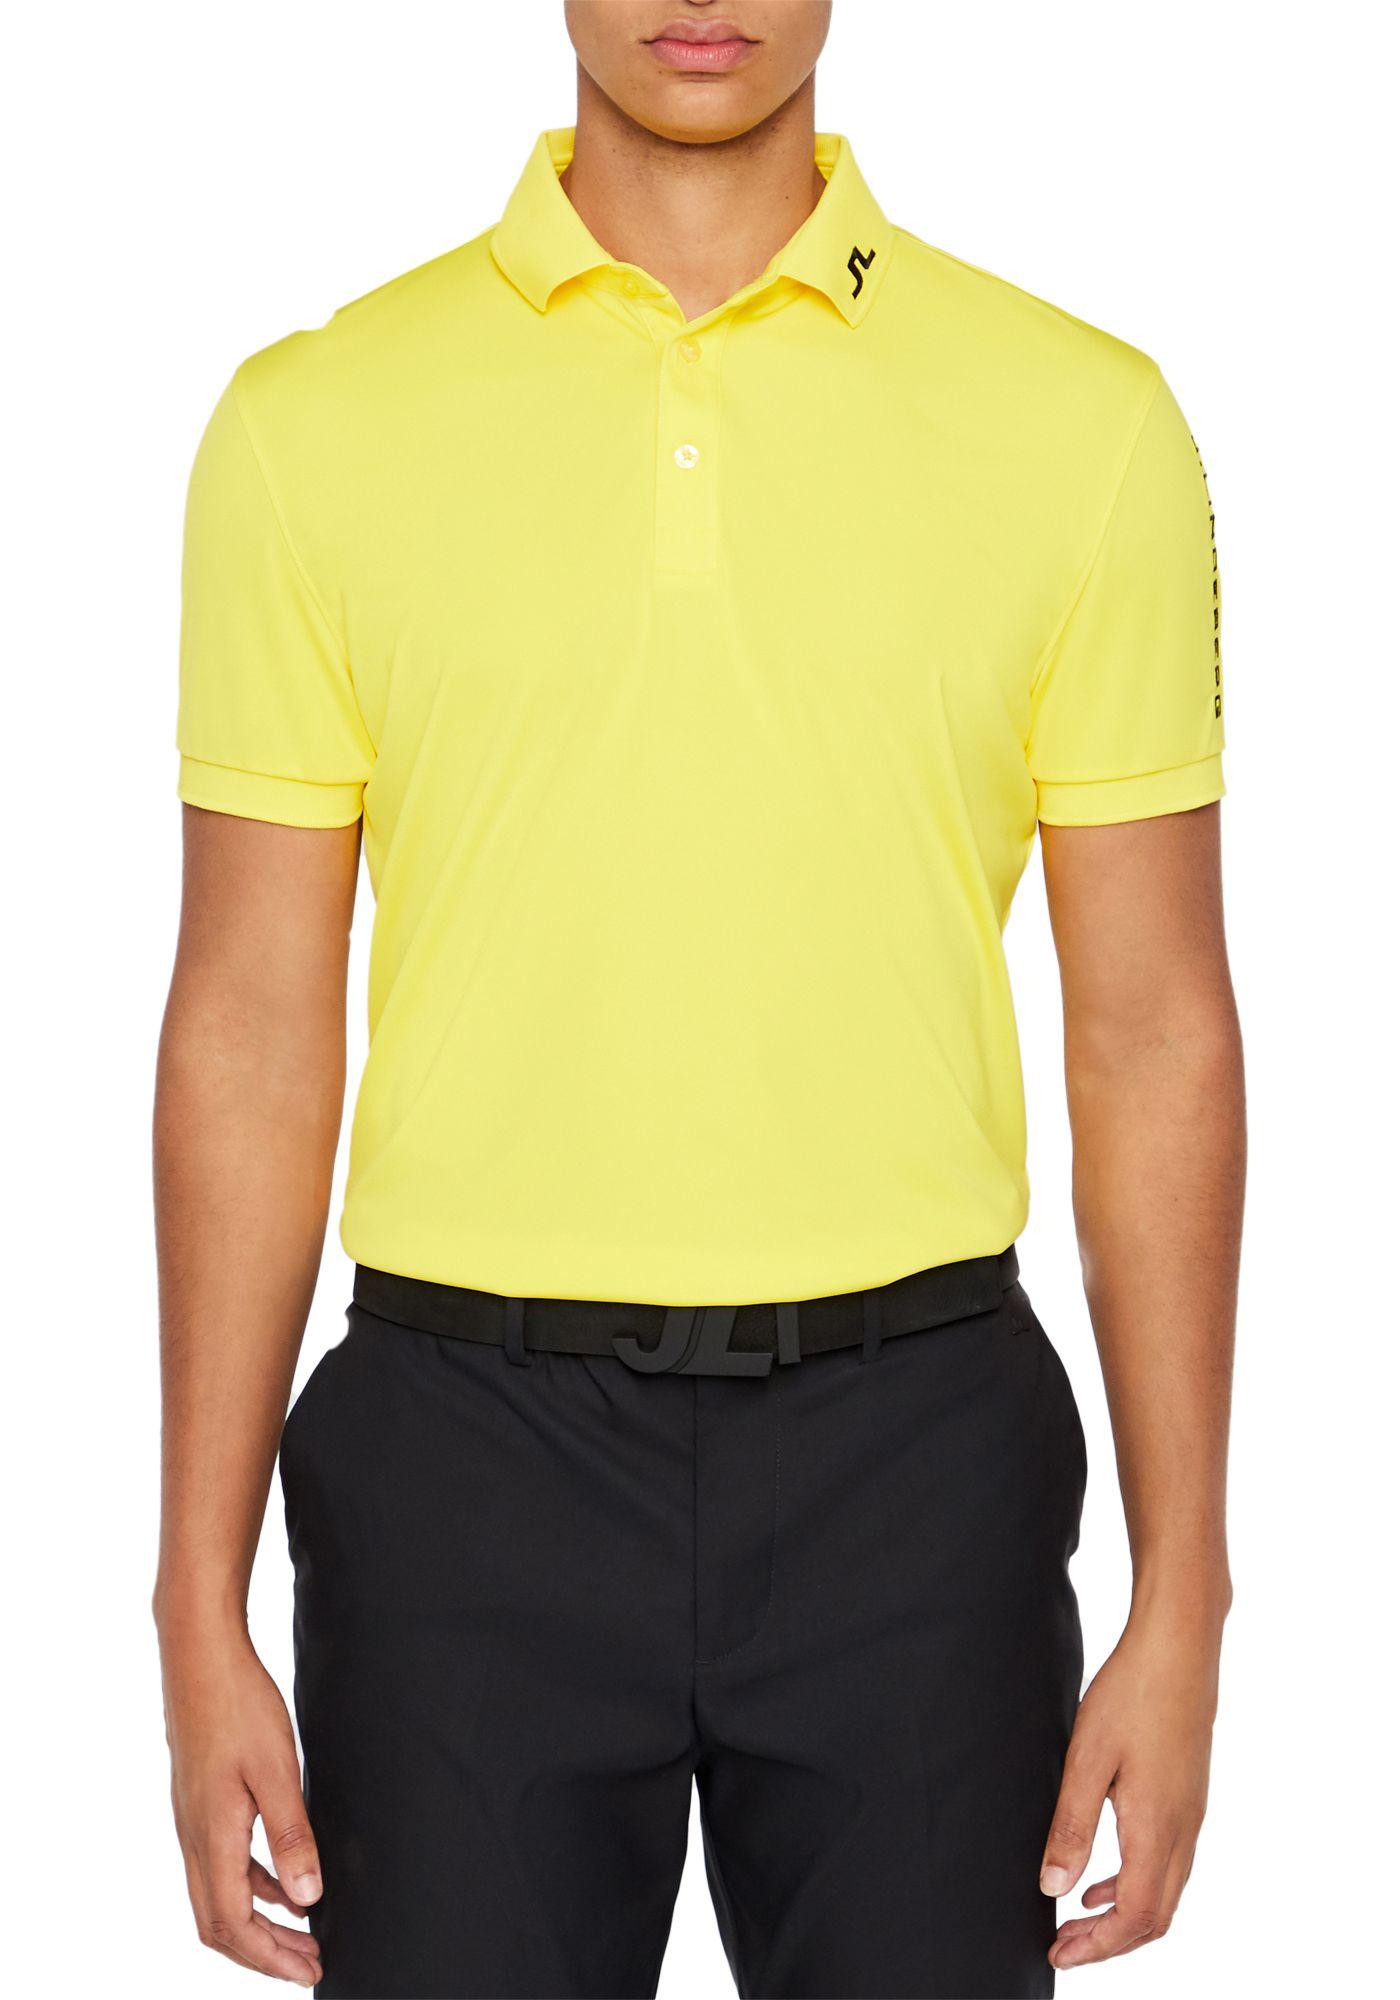 J.Lindeberg Men's Tour Tech Jersey Golf Polo